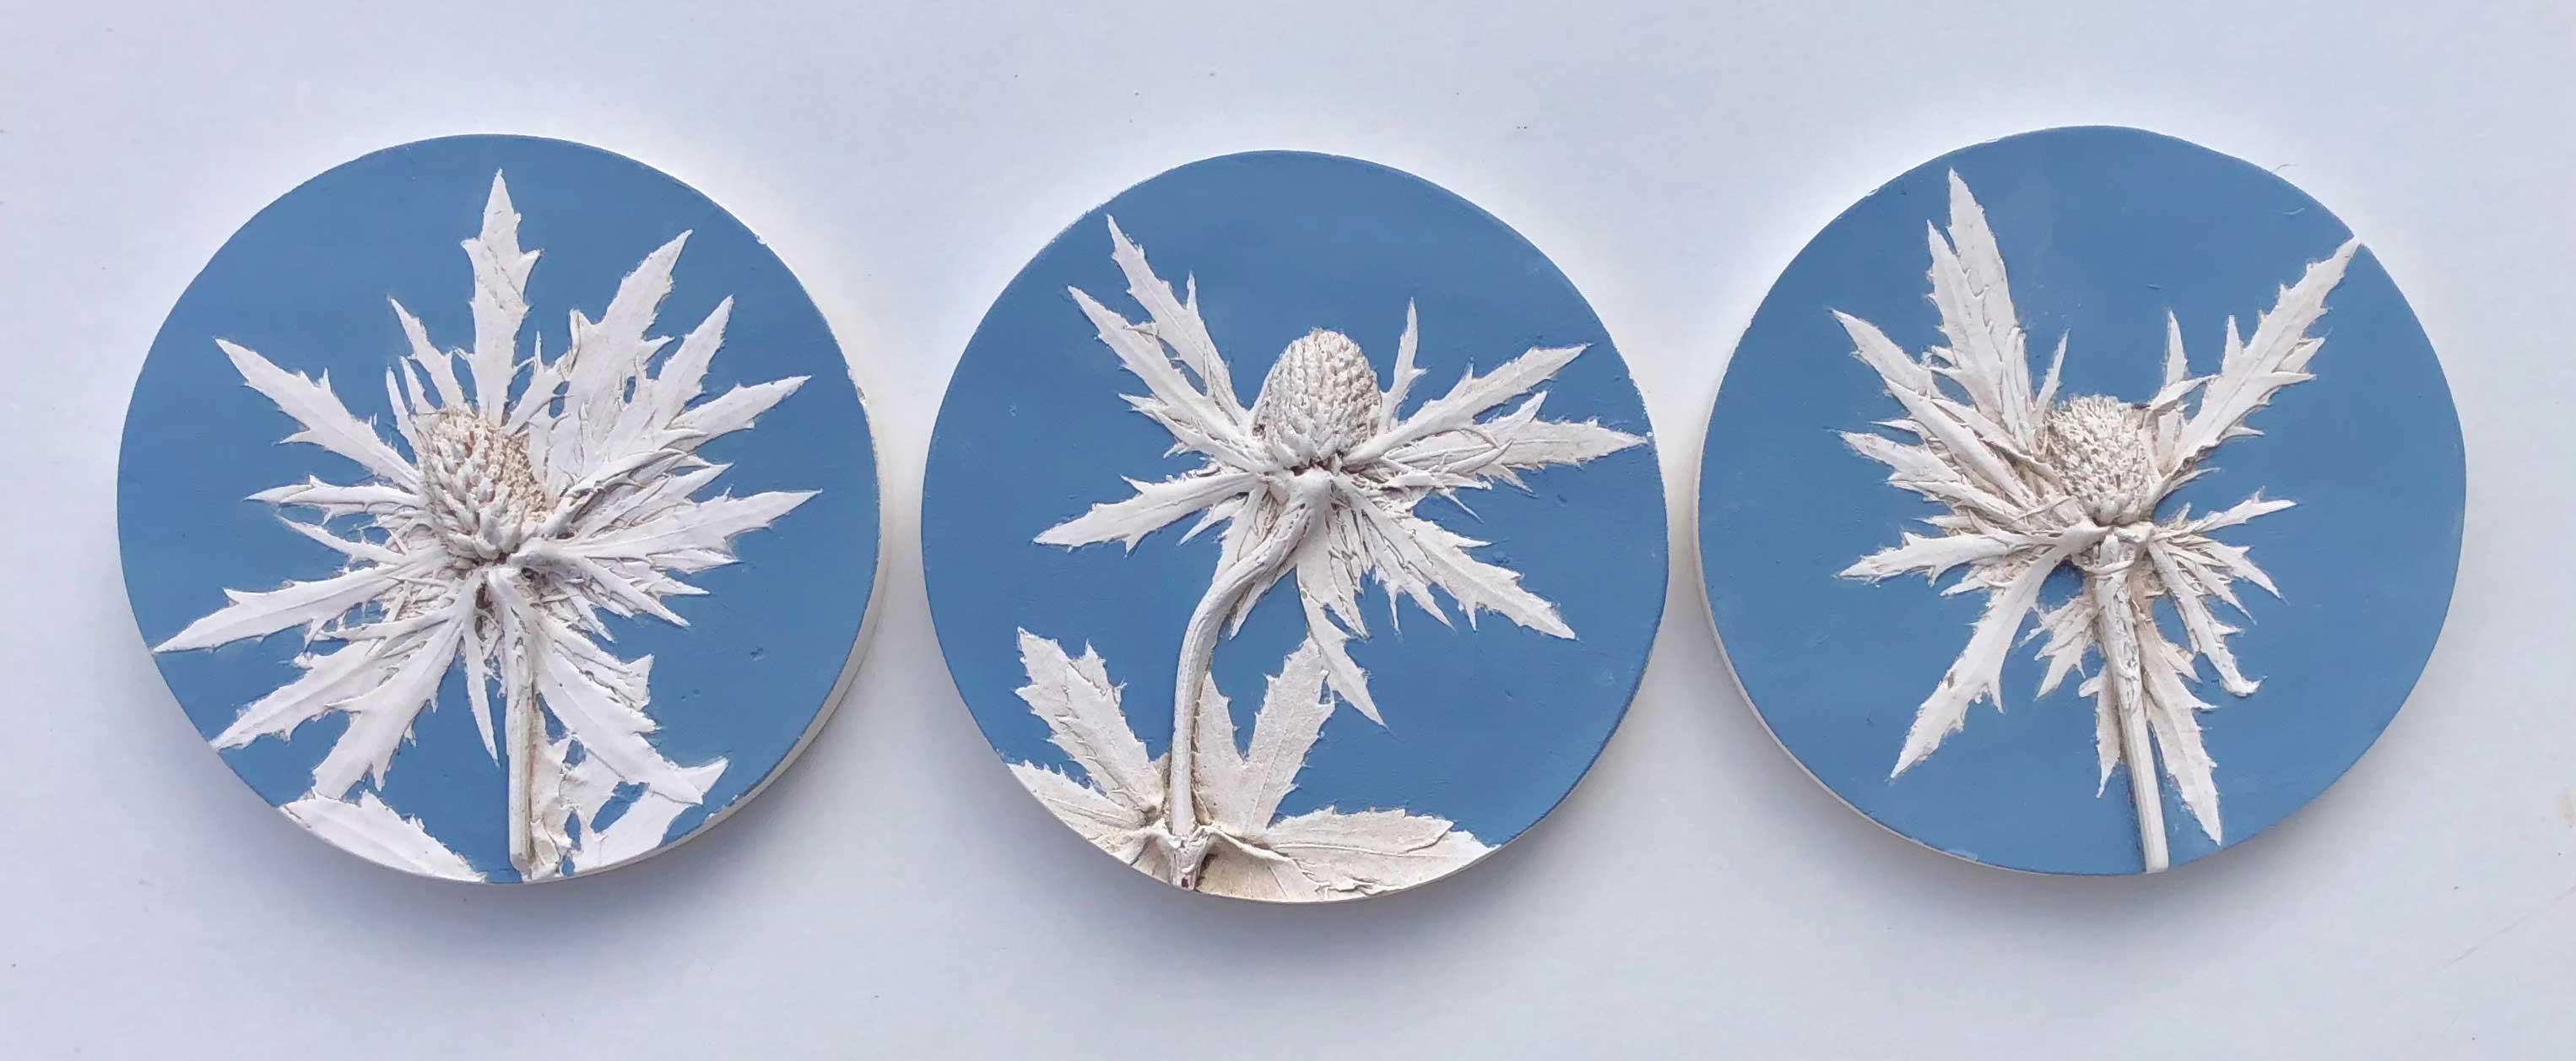 Katy Eccles Eryngium (Sea Holly) set of 3